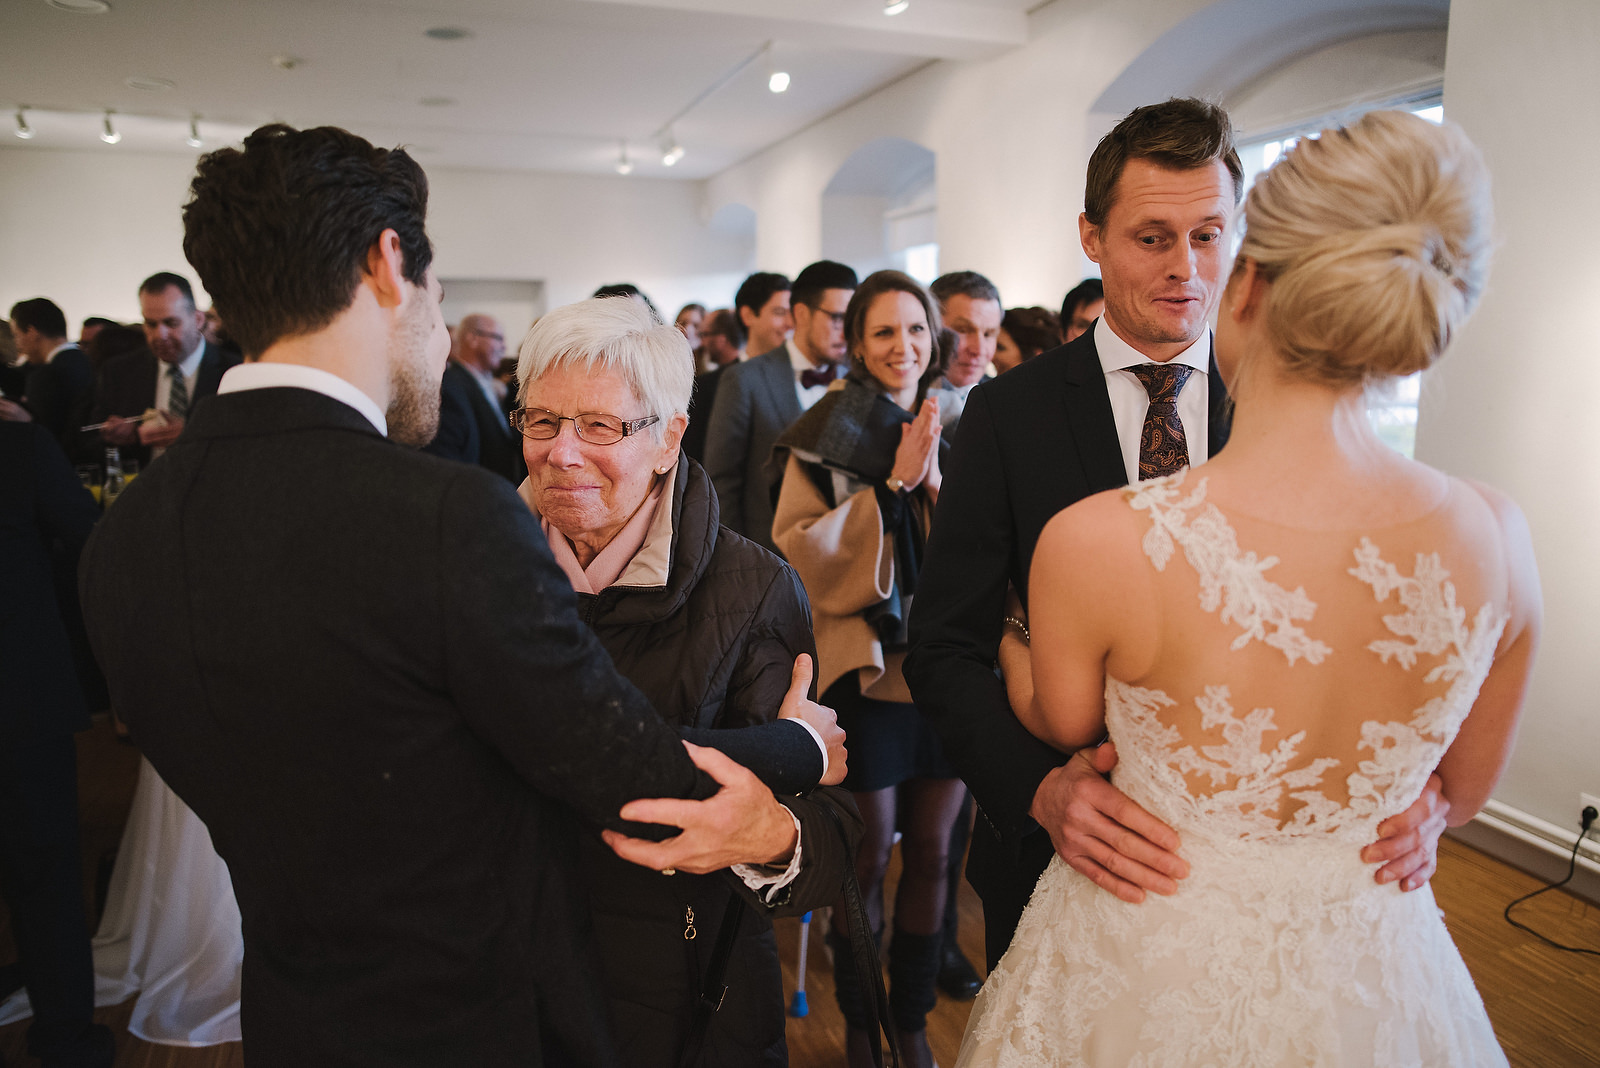 Fotograf Konstanz - Silvester Wedding in Hagnau / Friedrichshafen at Lake of Constance  - 28 -